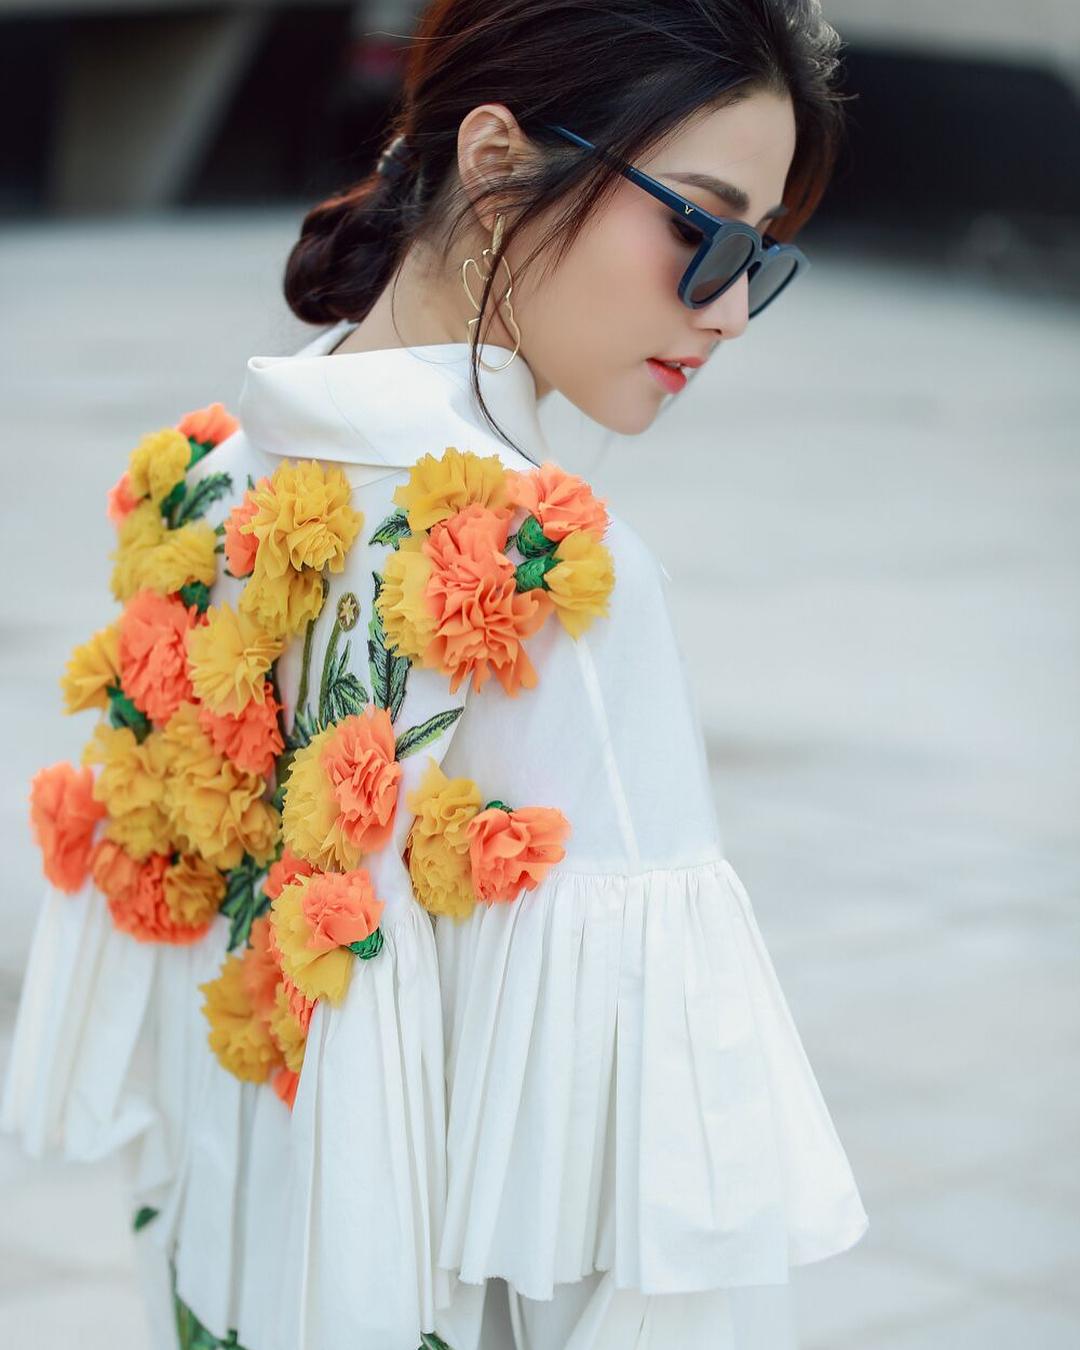 diem-my-ngam-nghia-street-style-cua-sao-viet-tai-seoul-fashion-week